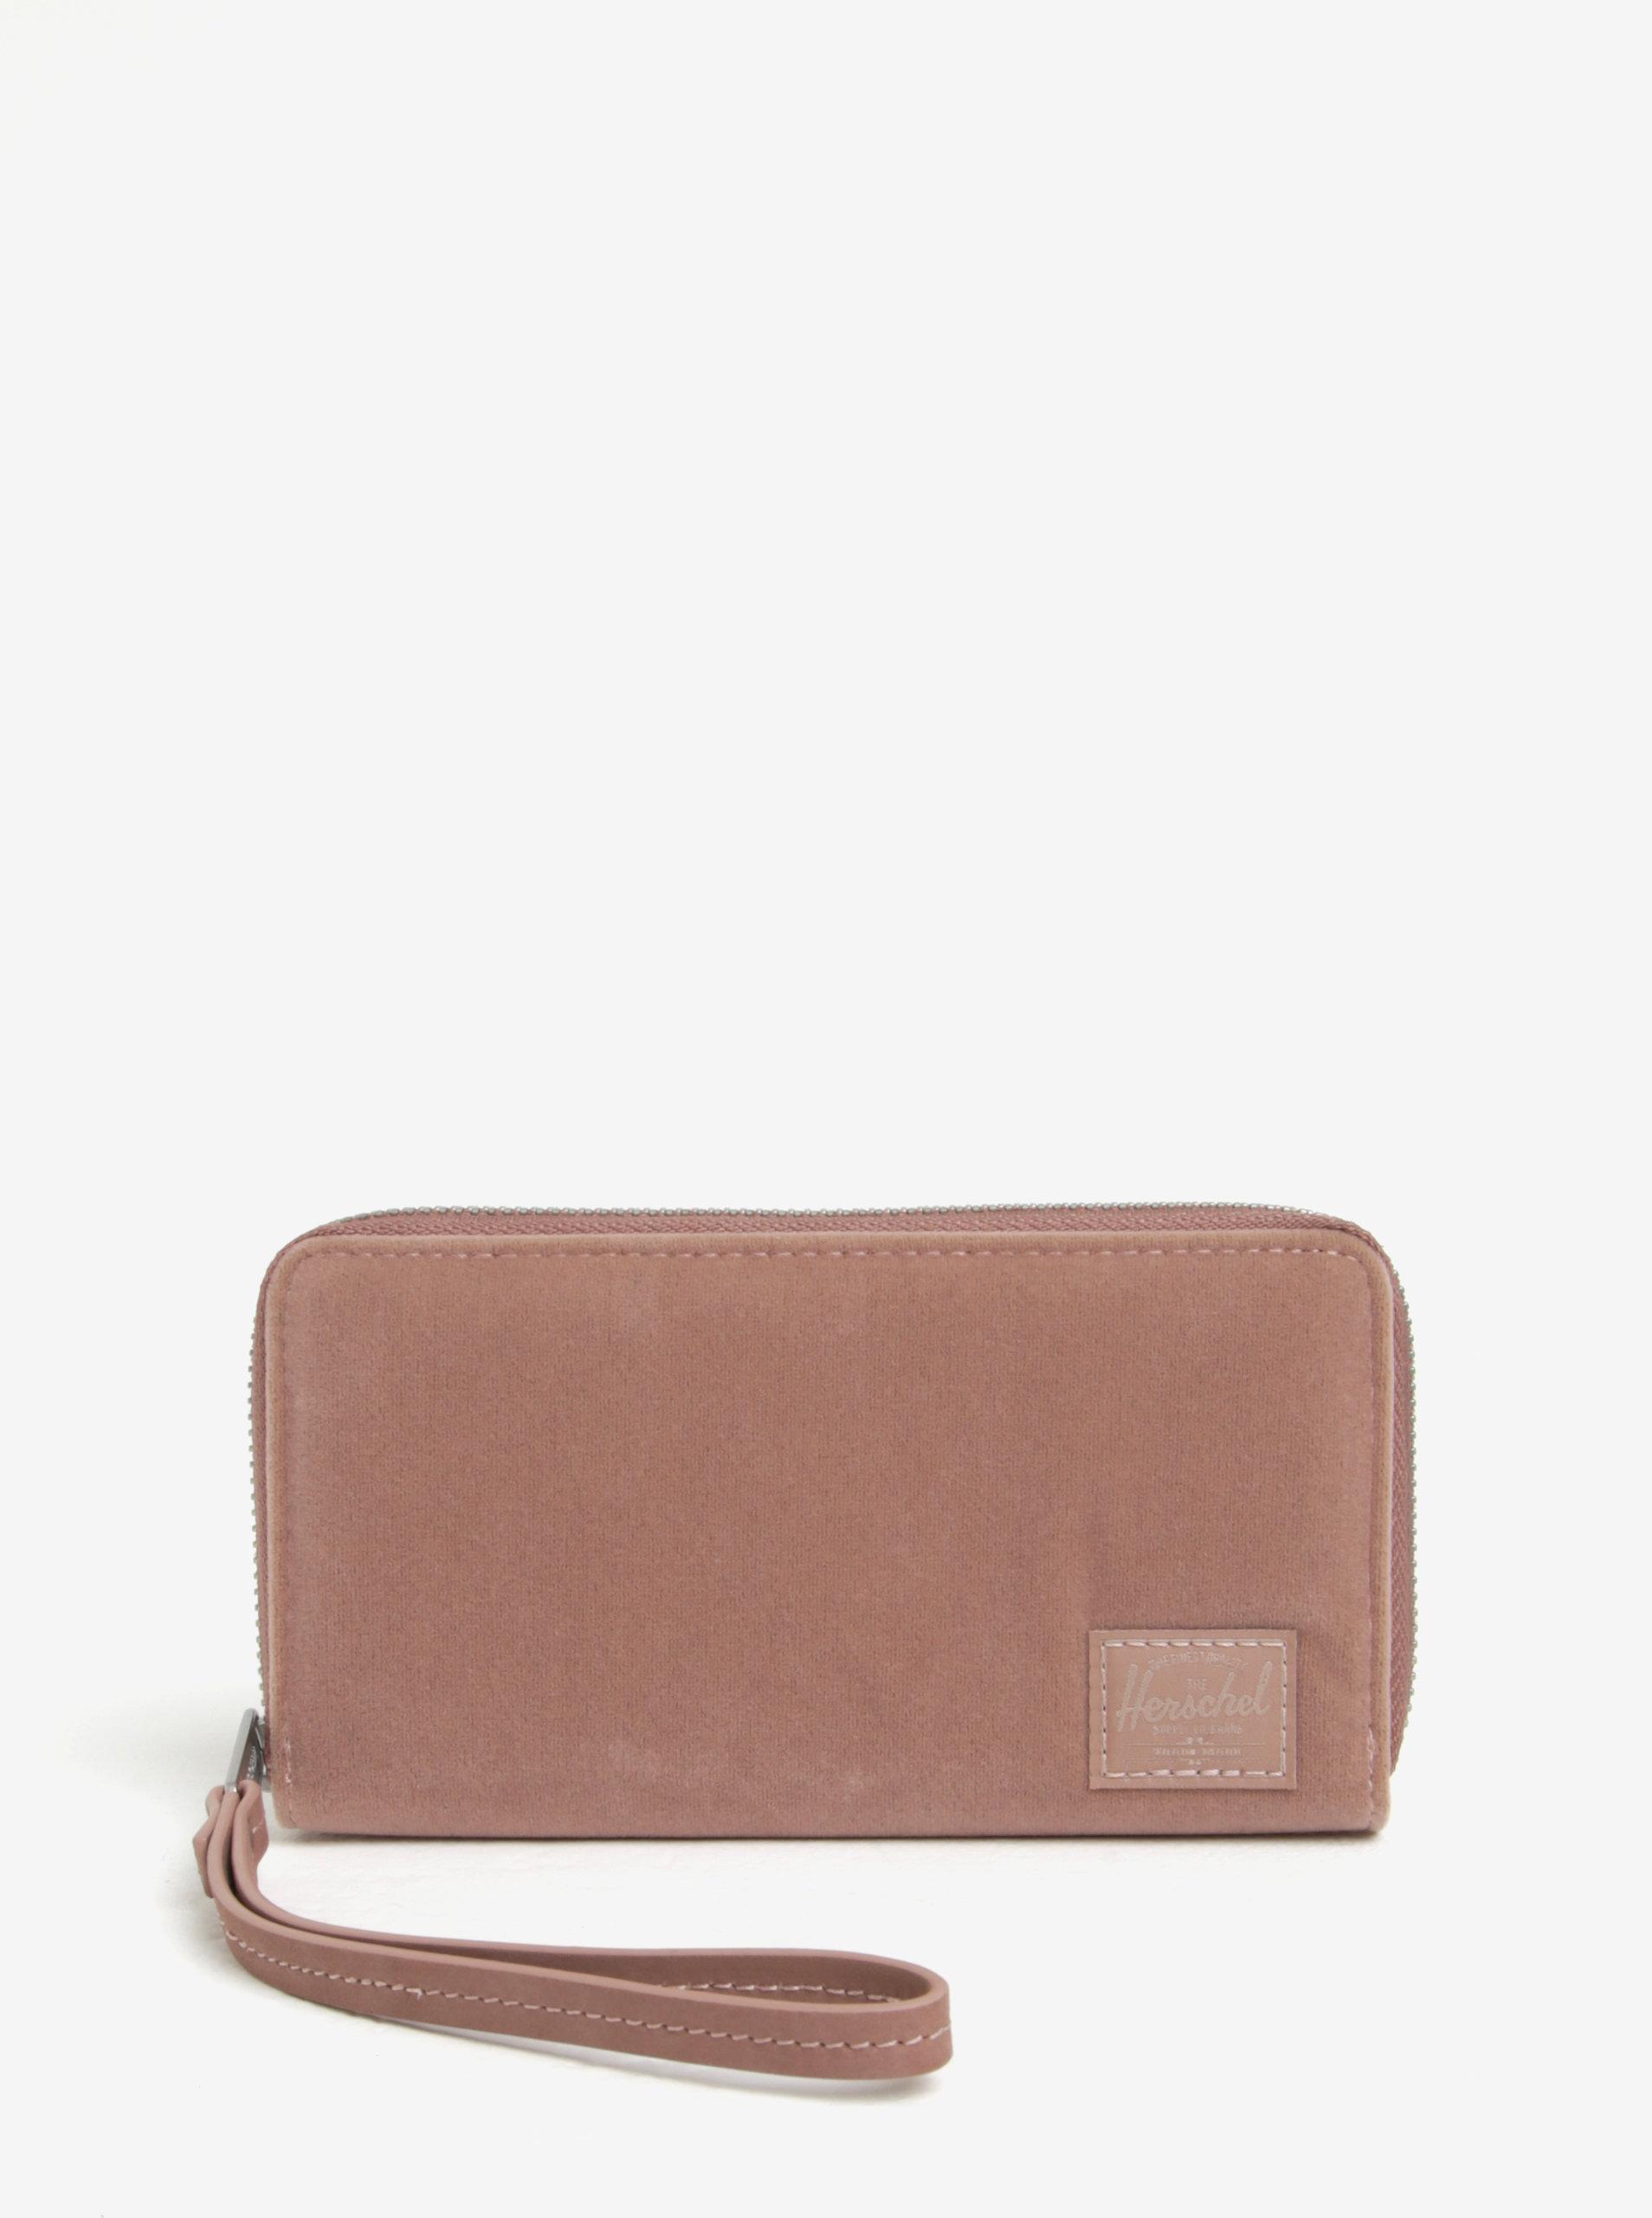 1edeebac8 Staroružová dámska zamatová peňaženka Herschel Thomas   ZOOT.sk